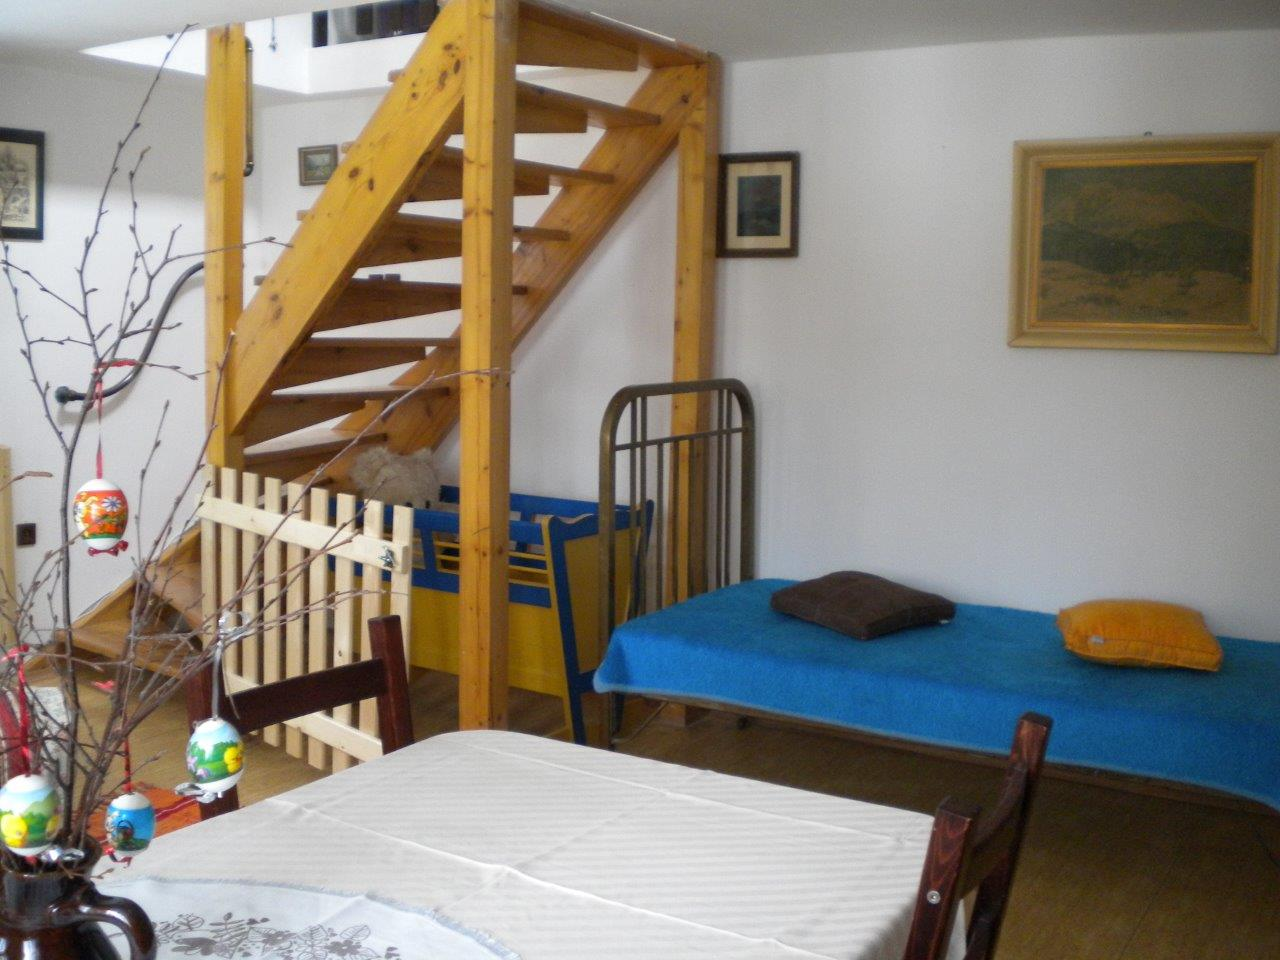 Familienwohnung Kytlice, Ústí nad Labem